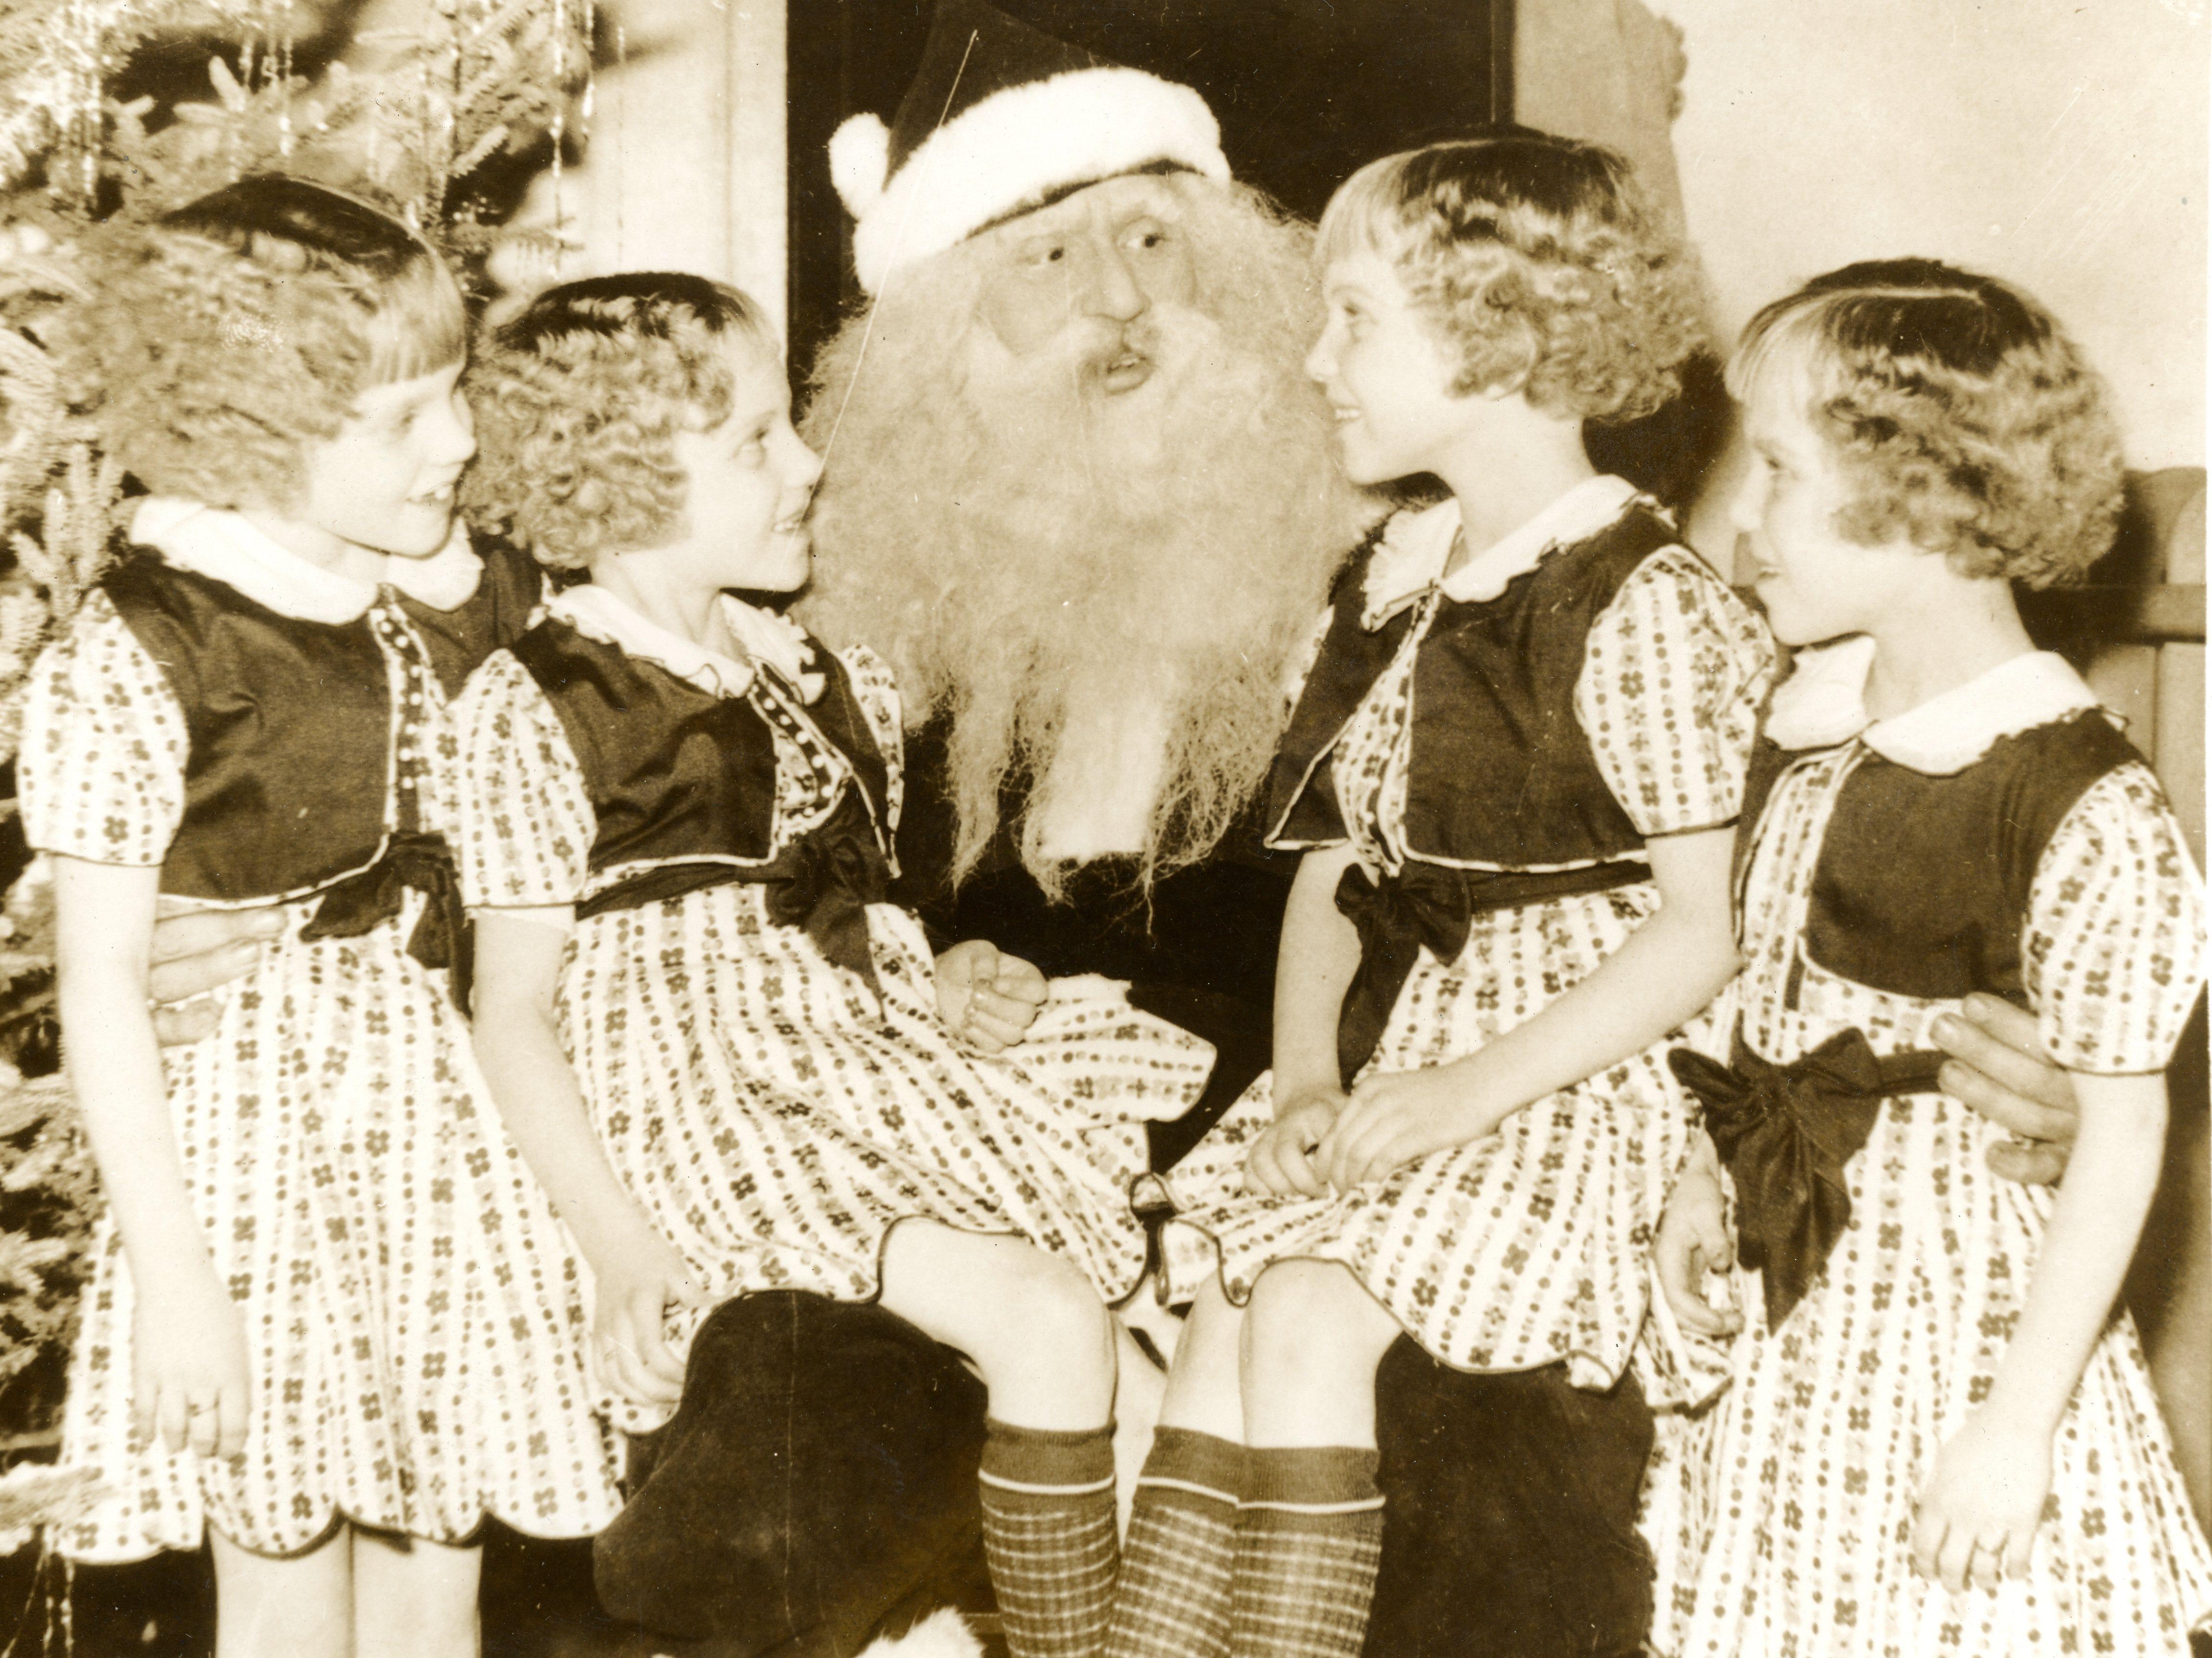 The Morlok quads visit Santa, date unknown.